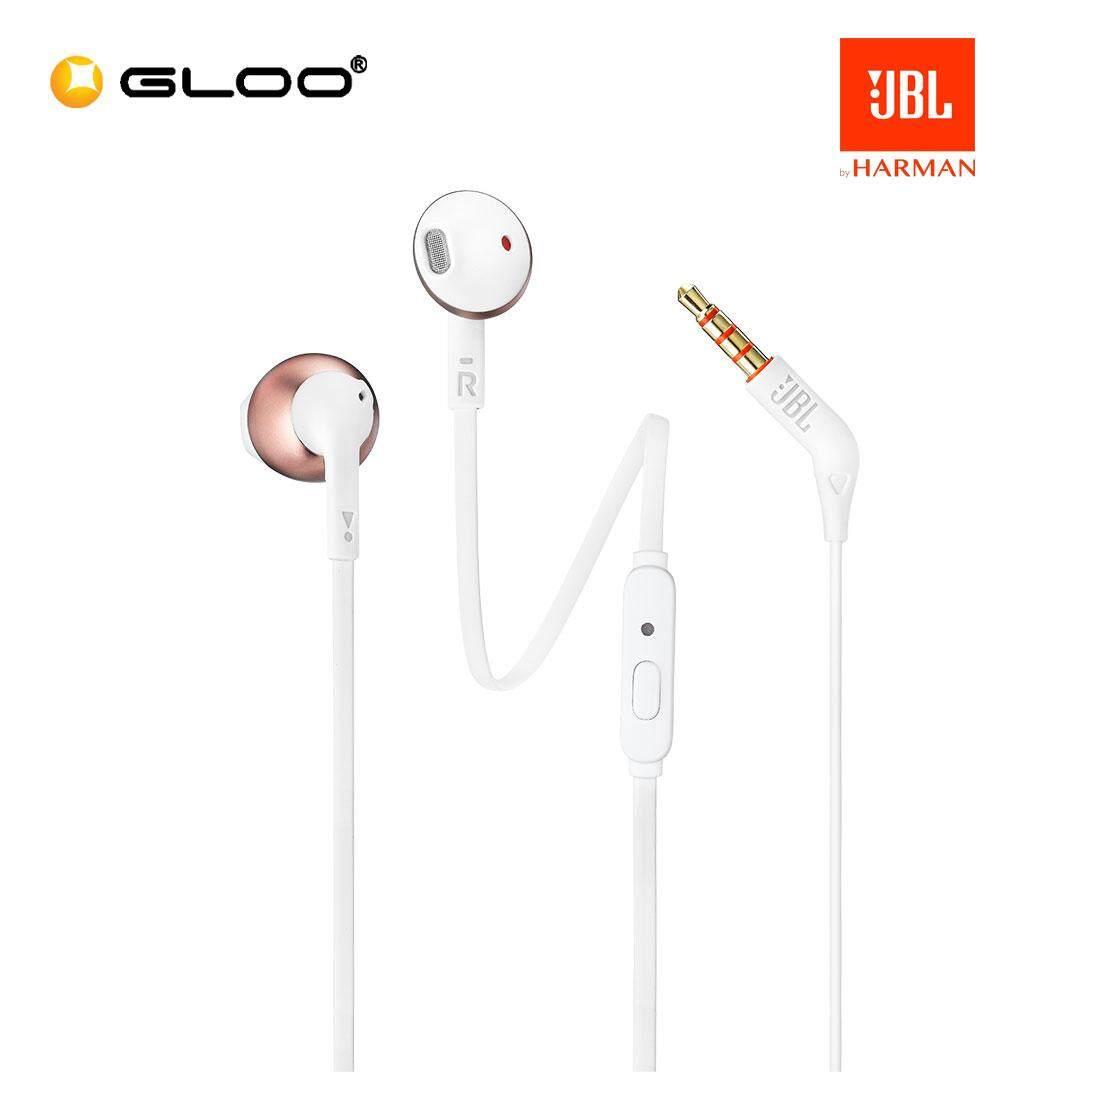 JBL T205 Earbud Headphones Black/Cream/RoseGold